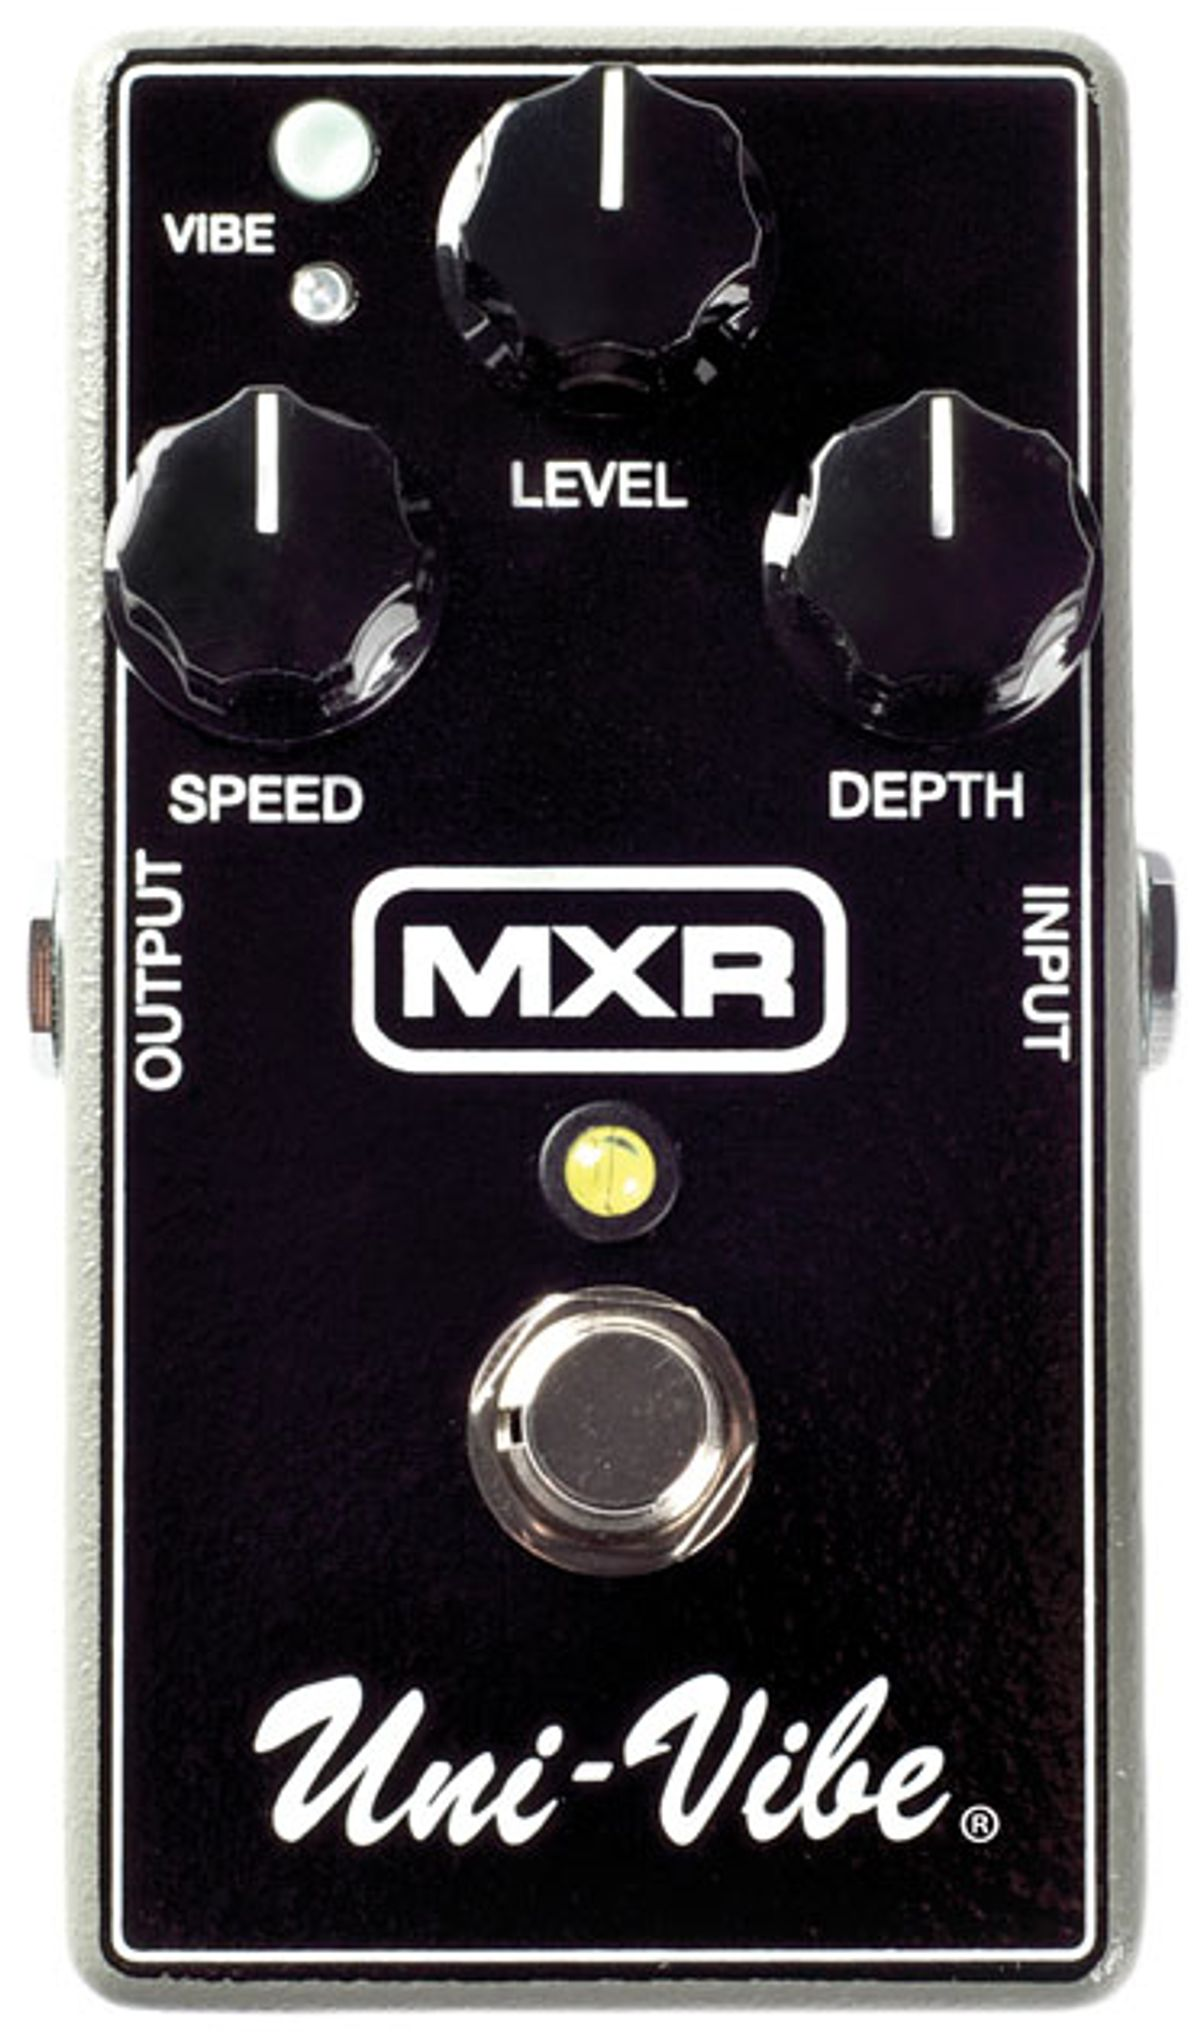 MXR M68 Uni-Vibe Review